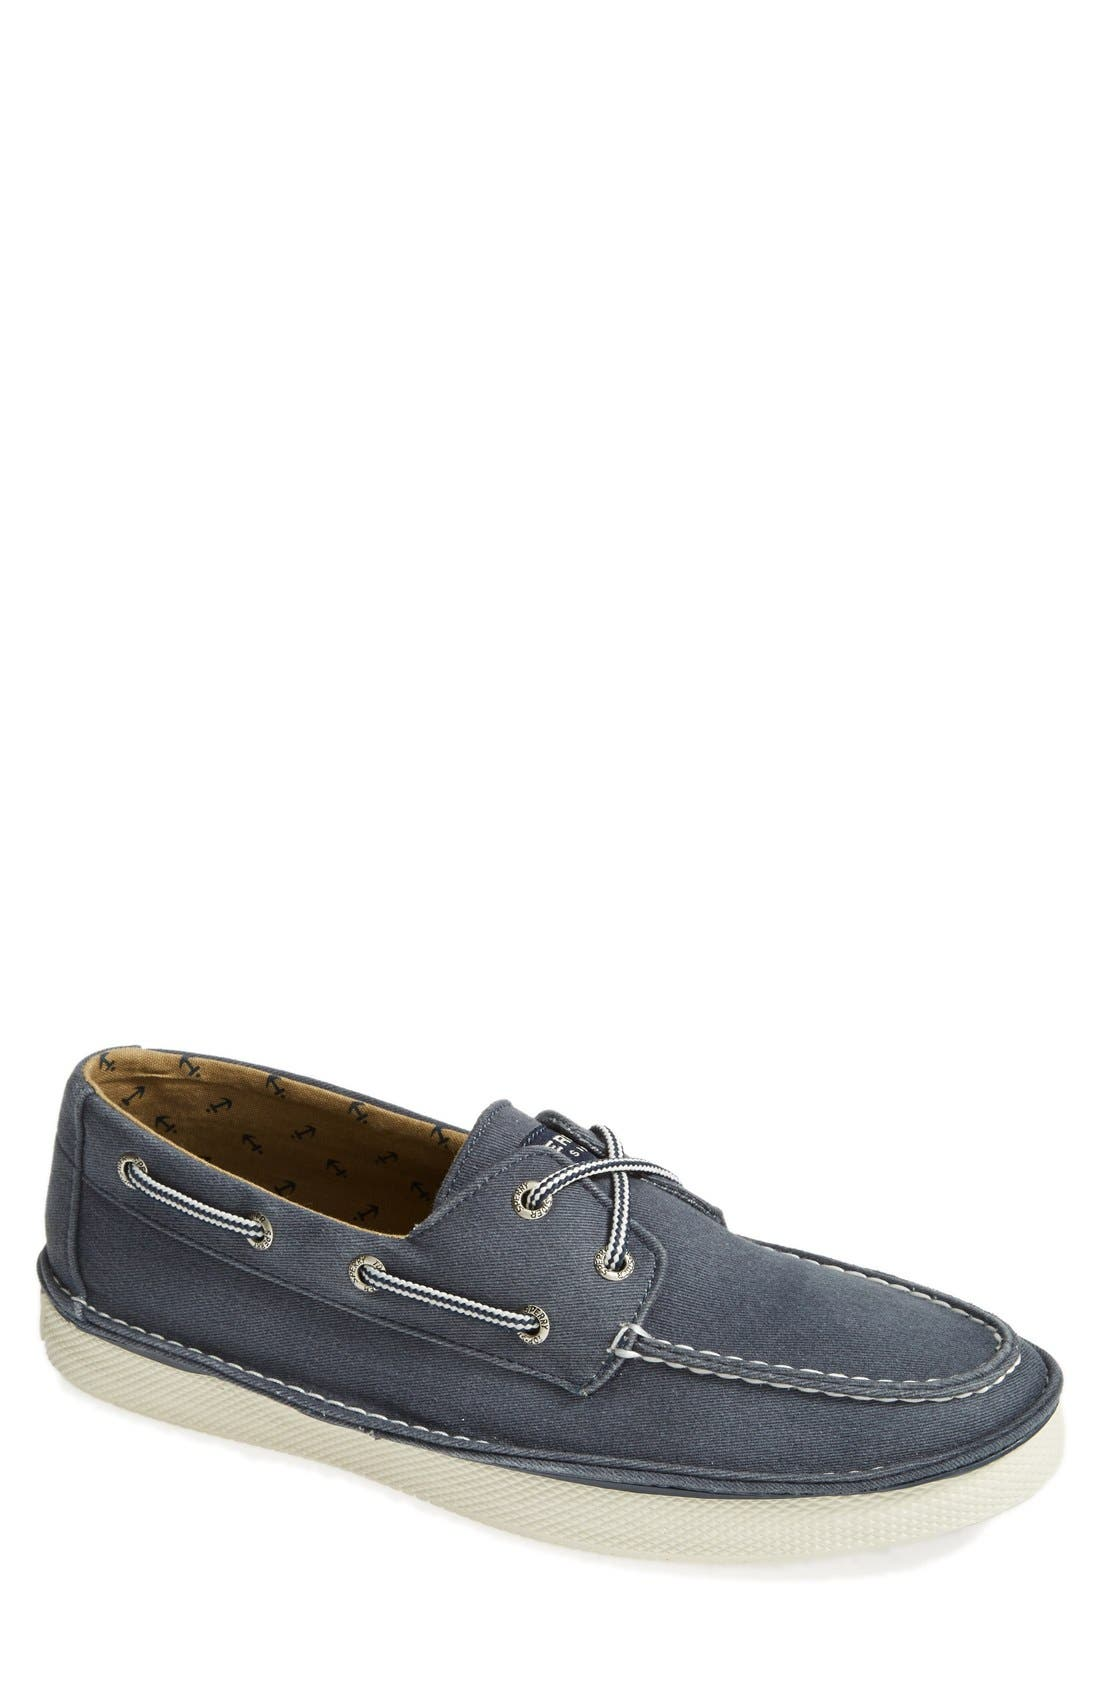 Alternate Image 1 Selected - Sperry 'Cruz' Canvas Boat Shoe (Men)